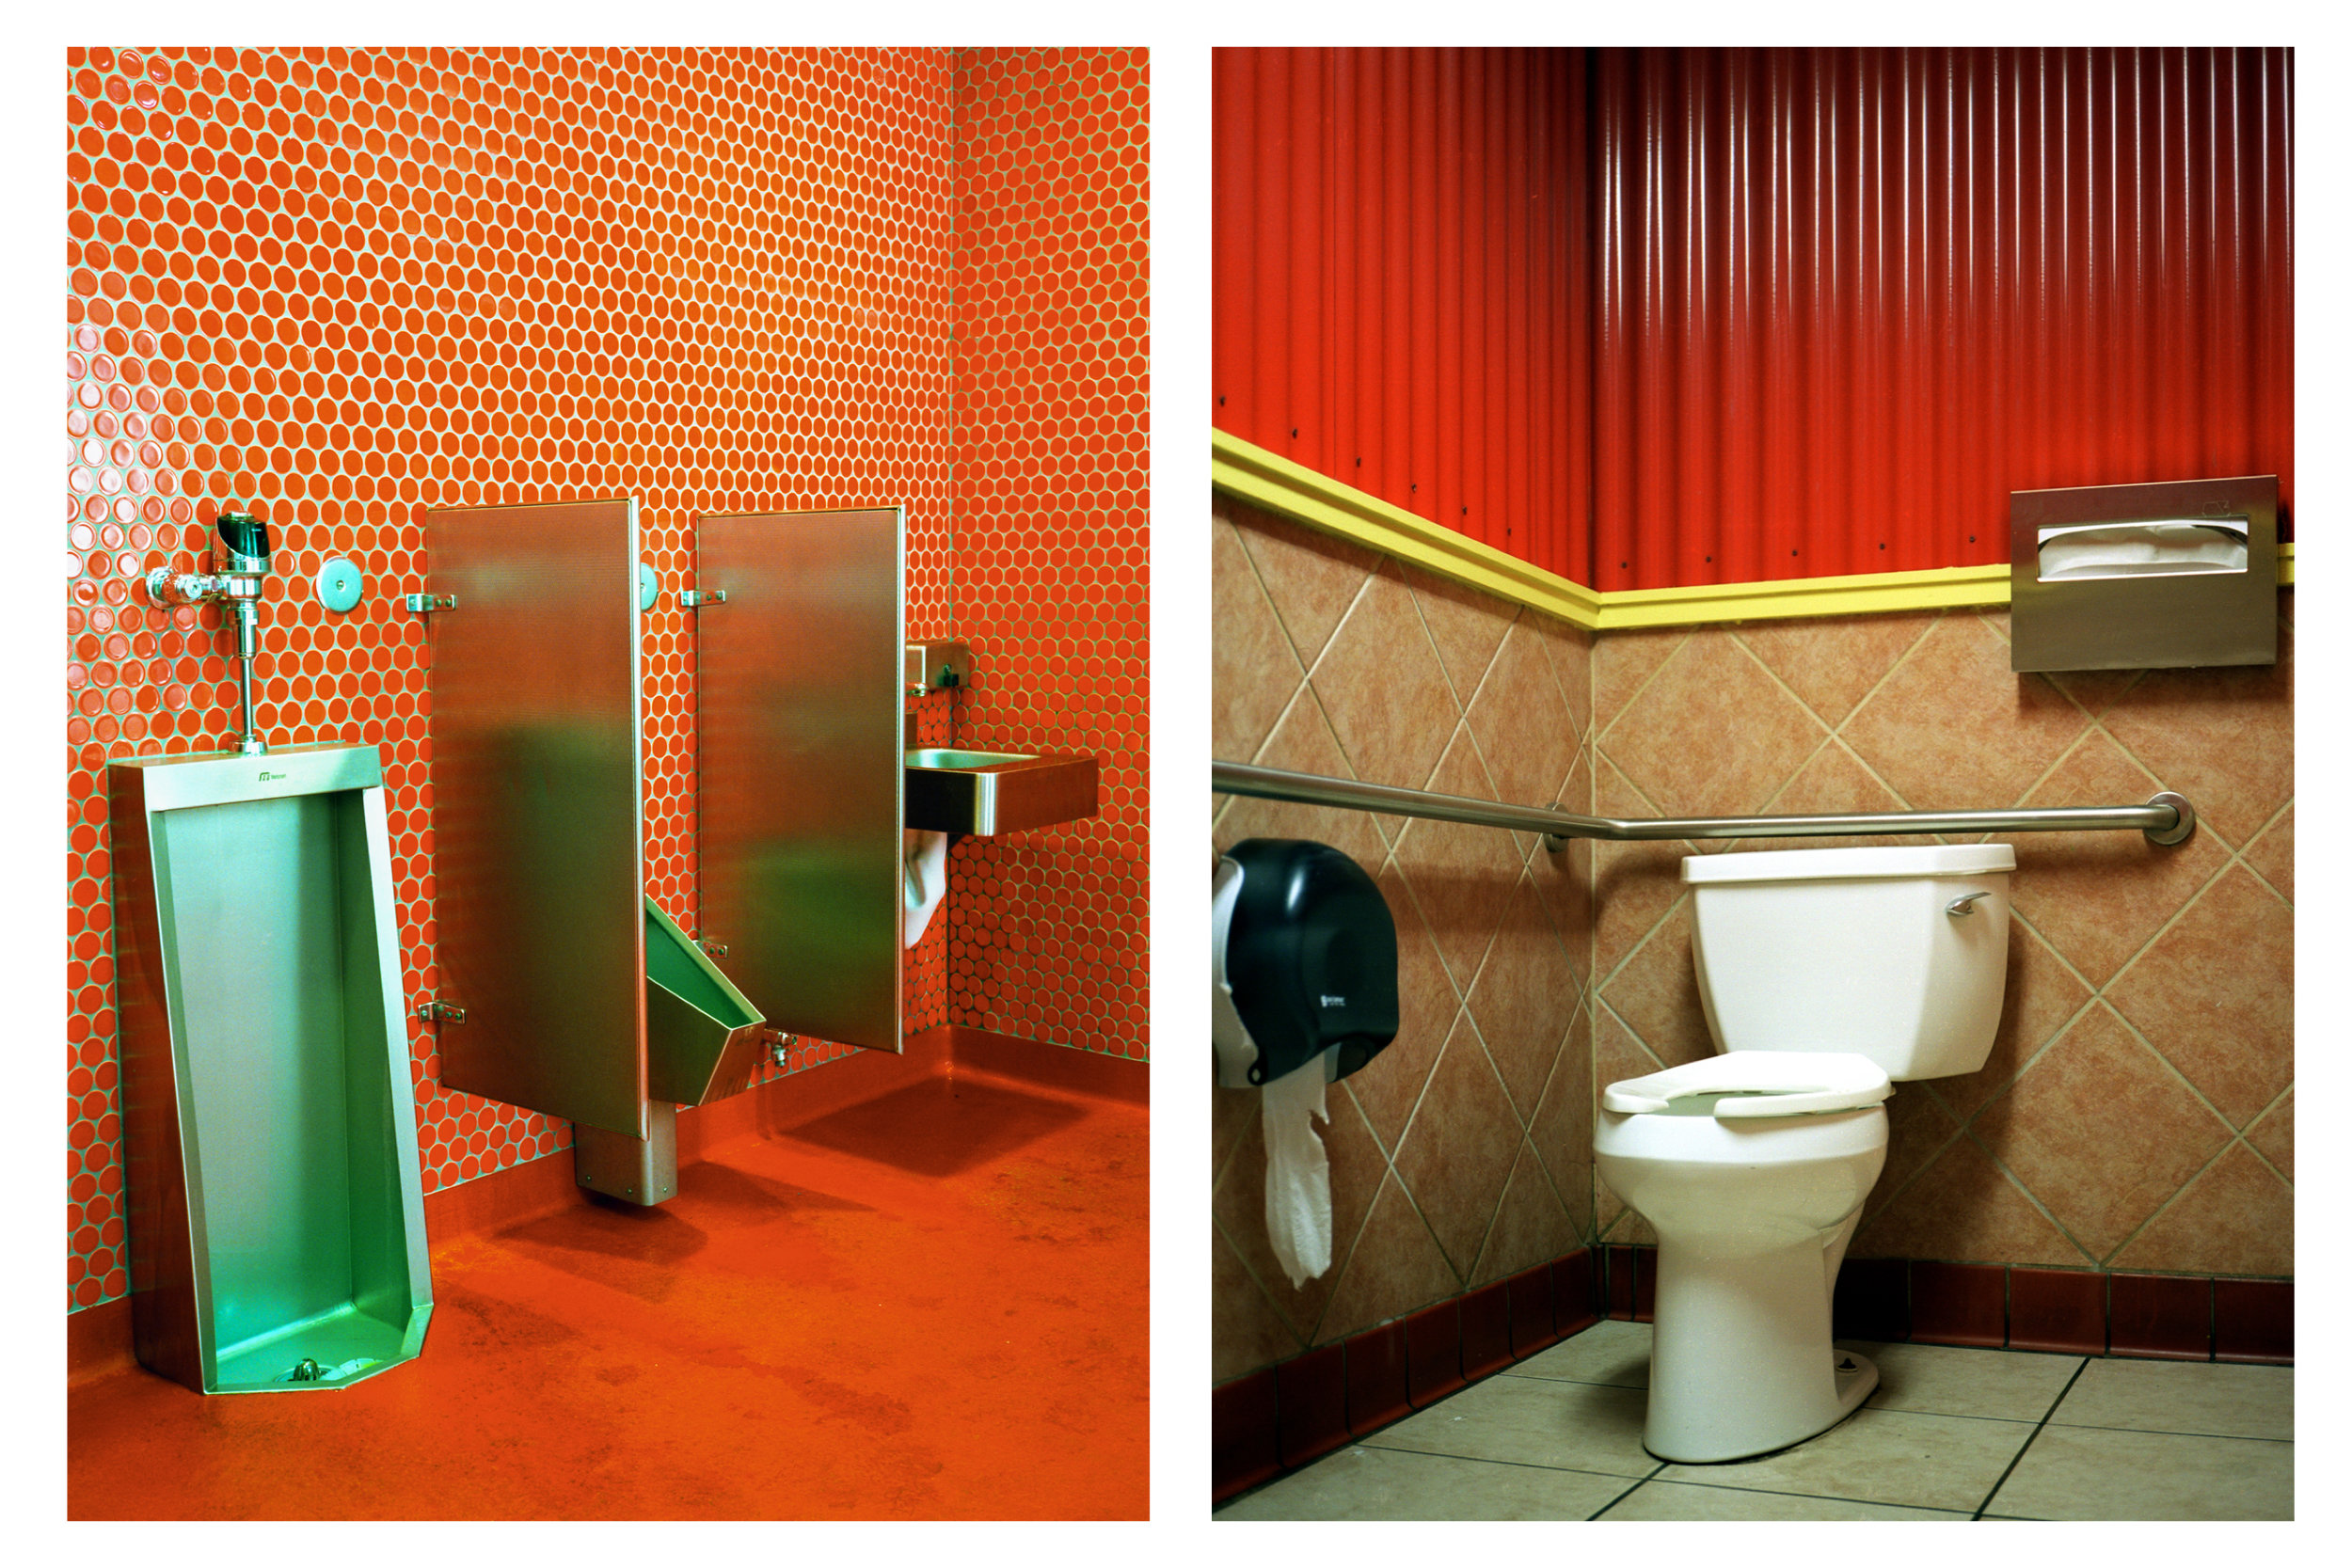 red and orange, restrooms, medium format analog